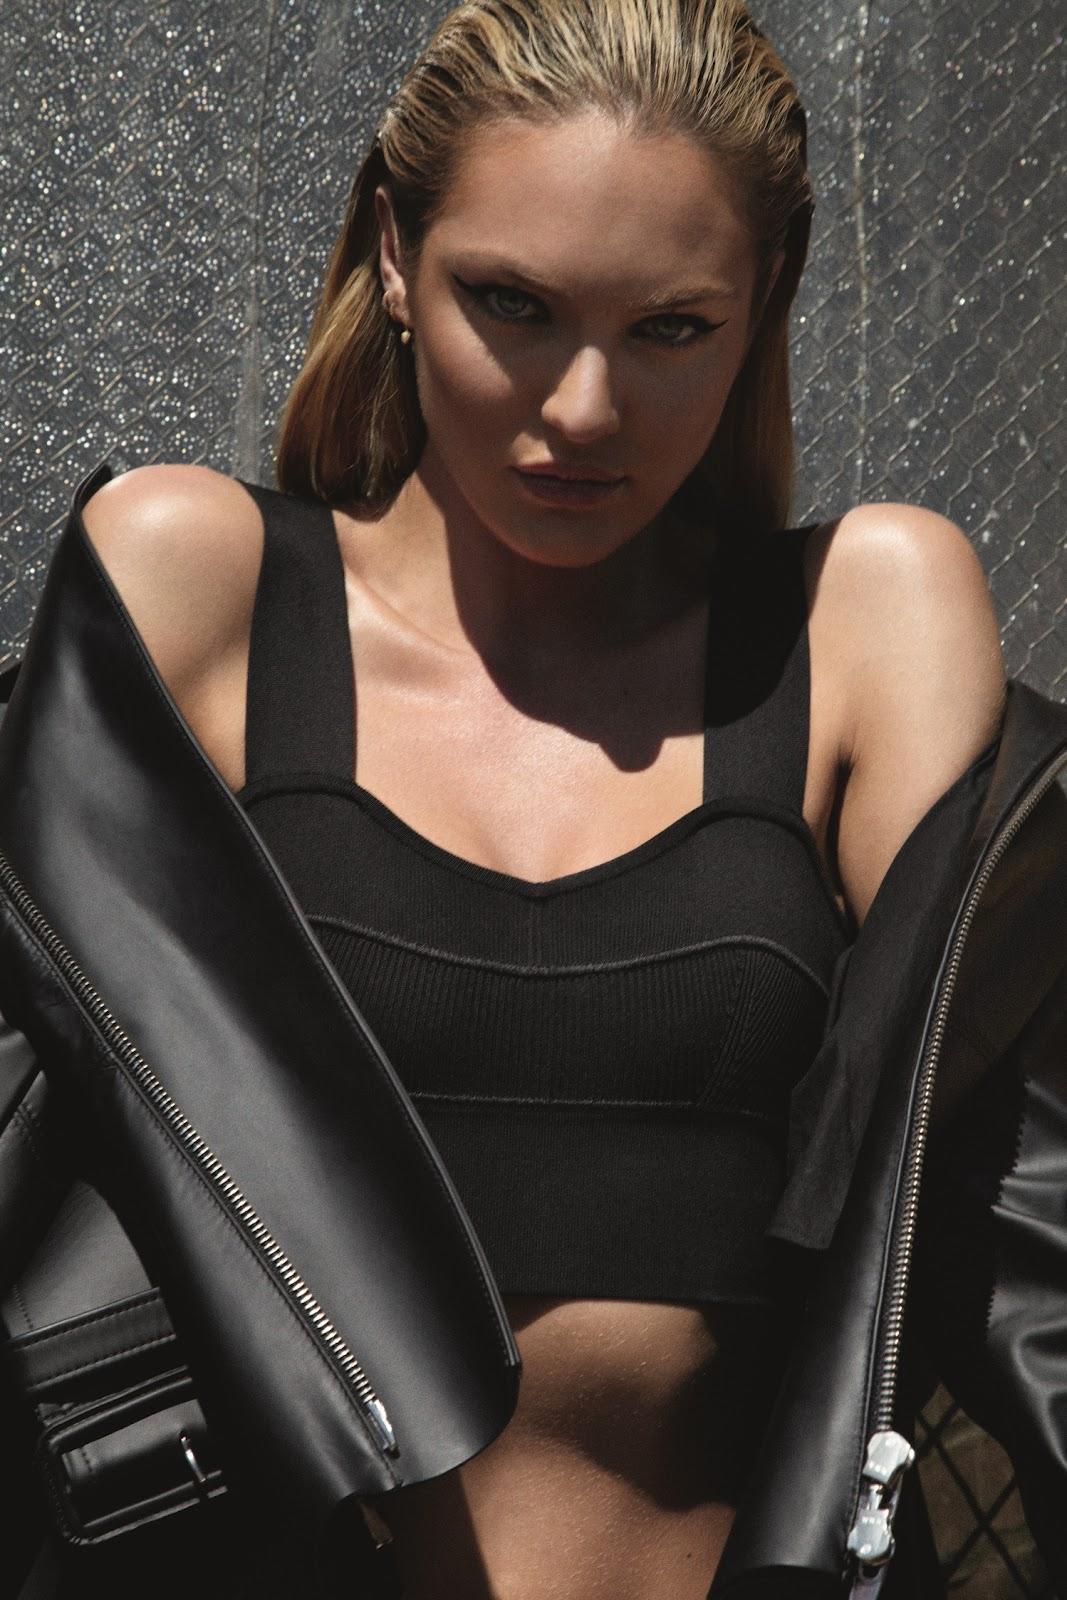 http://2.bp.blogspot.com/-GS3JFQCAvkA/UBTMeTT5HCI/AAAAAAAB04o/oByMpfgwM1I/s1600/Candice+Swanepoel+by+Collier+Schorr+(Candy+Cane+-+Muse+%2330+Summer+2012)+14.jpg